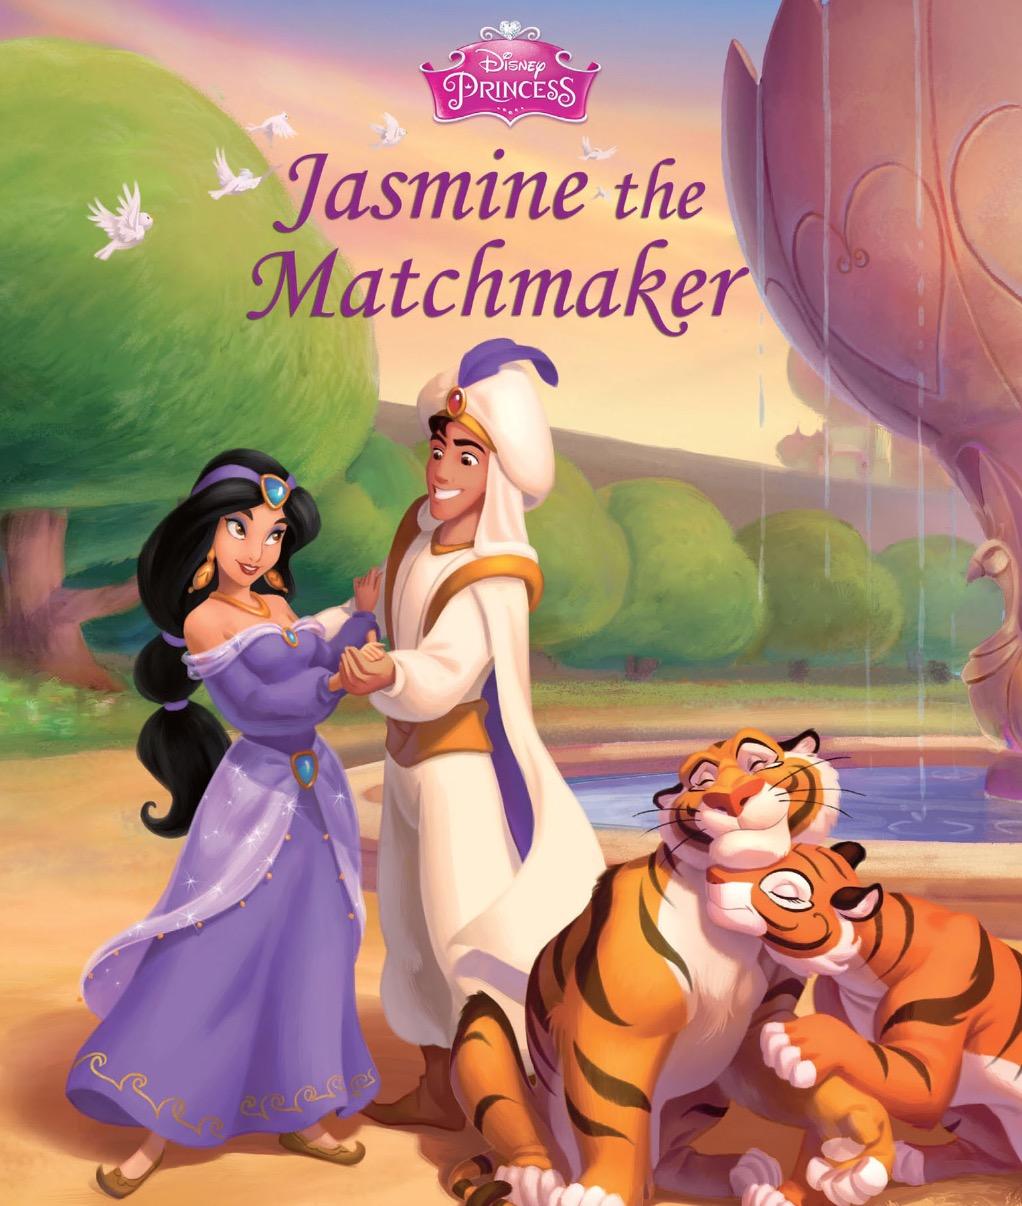 the matchmaker wikipedia